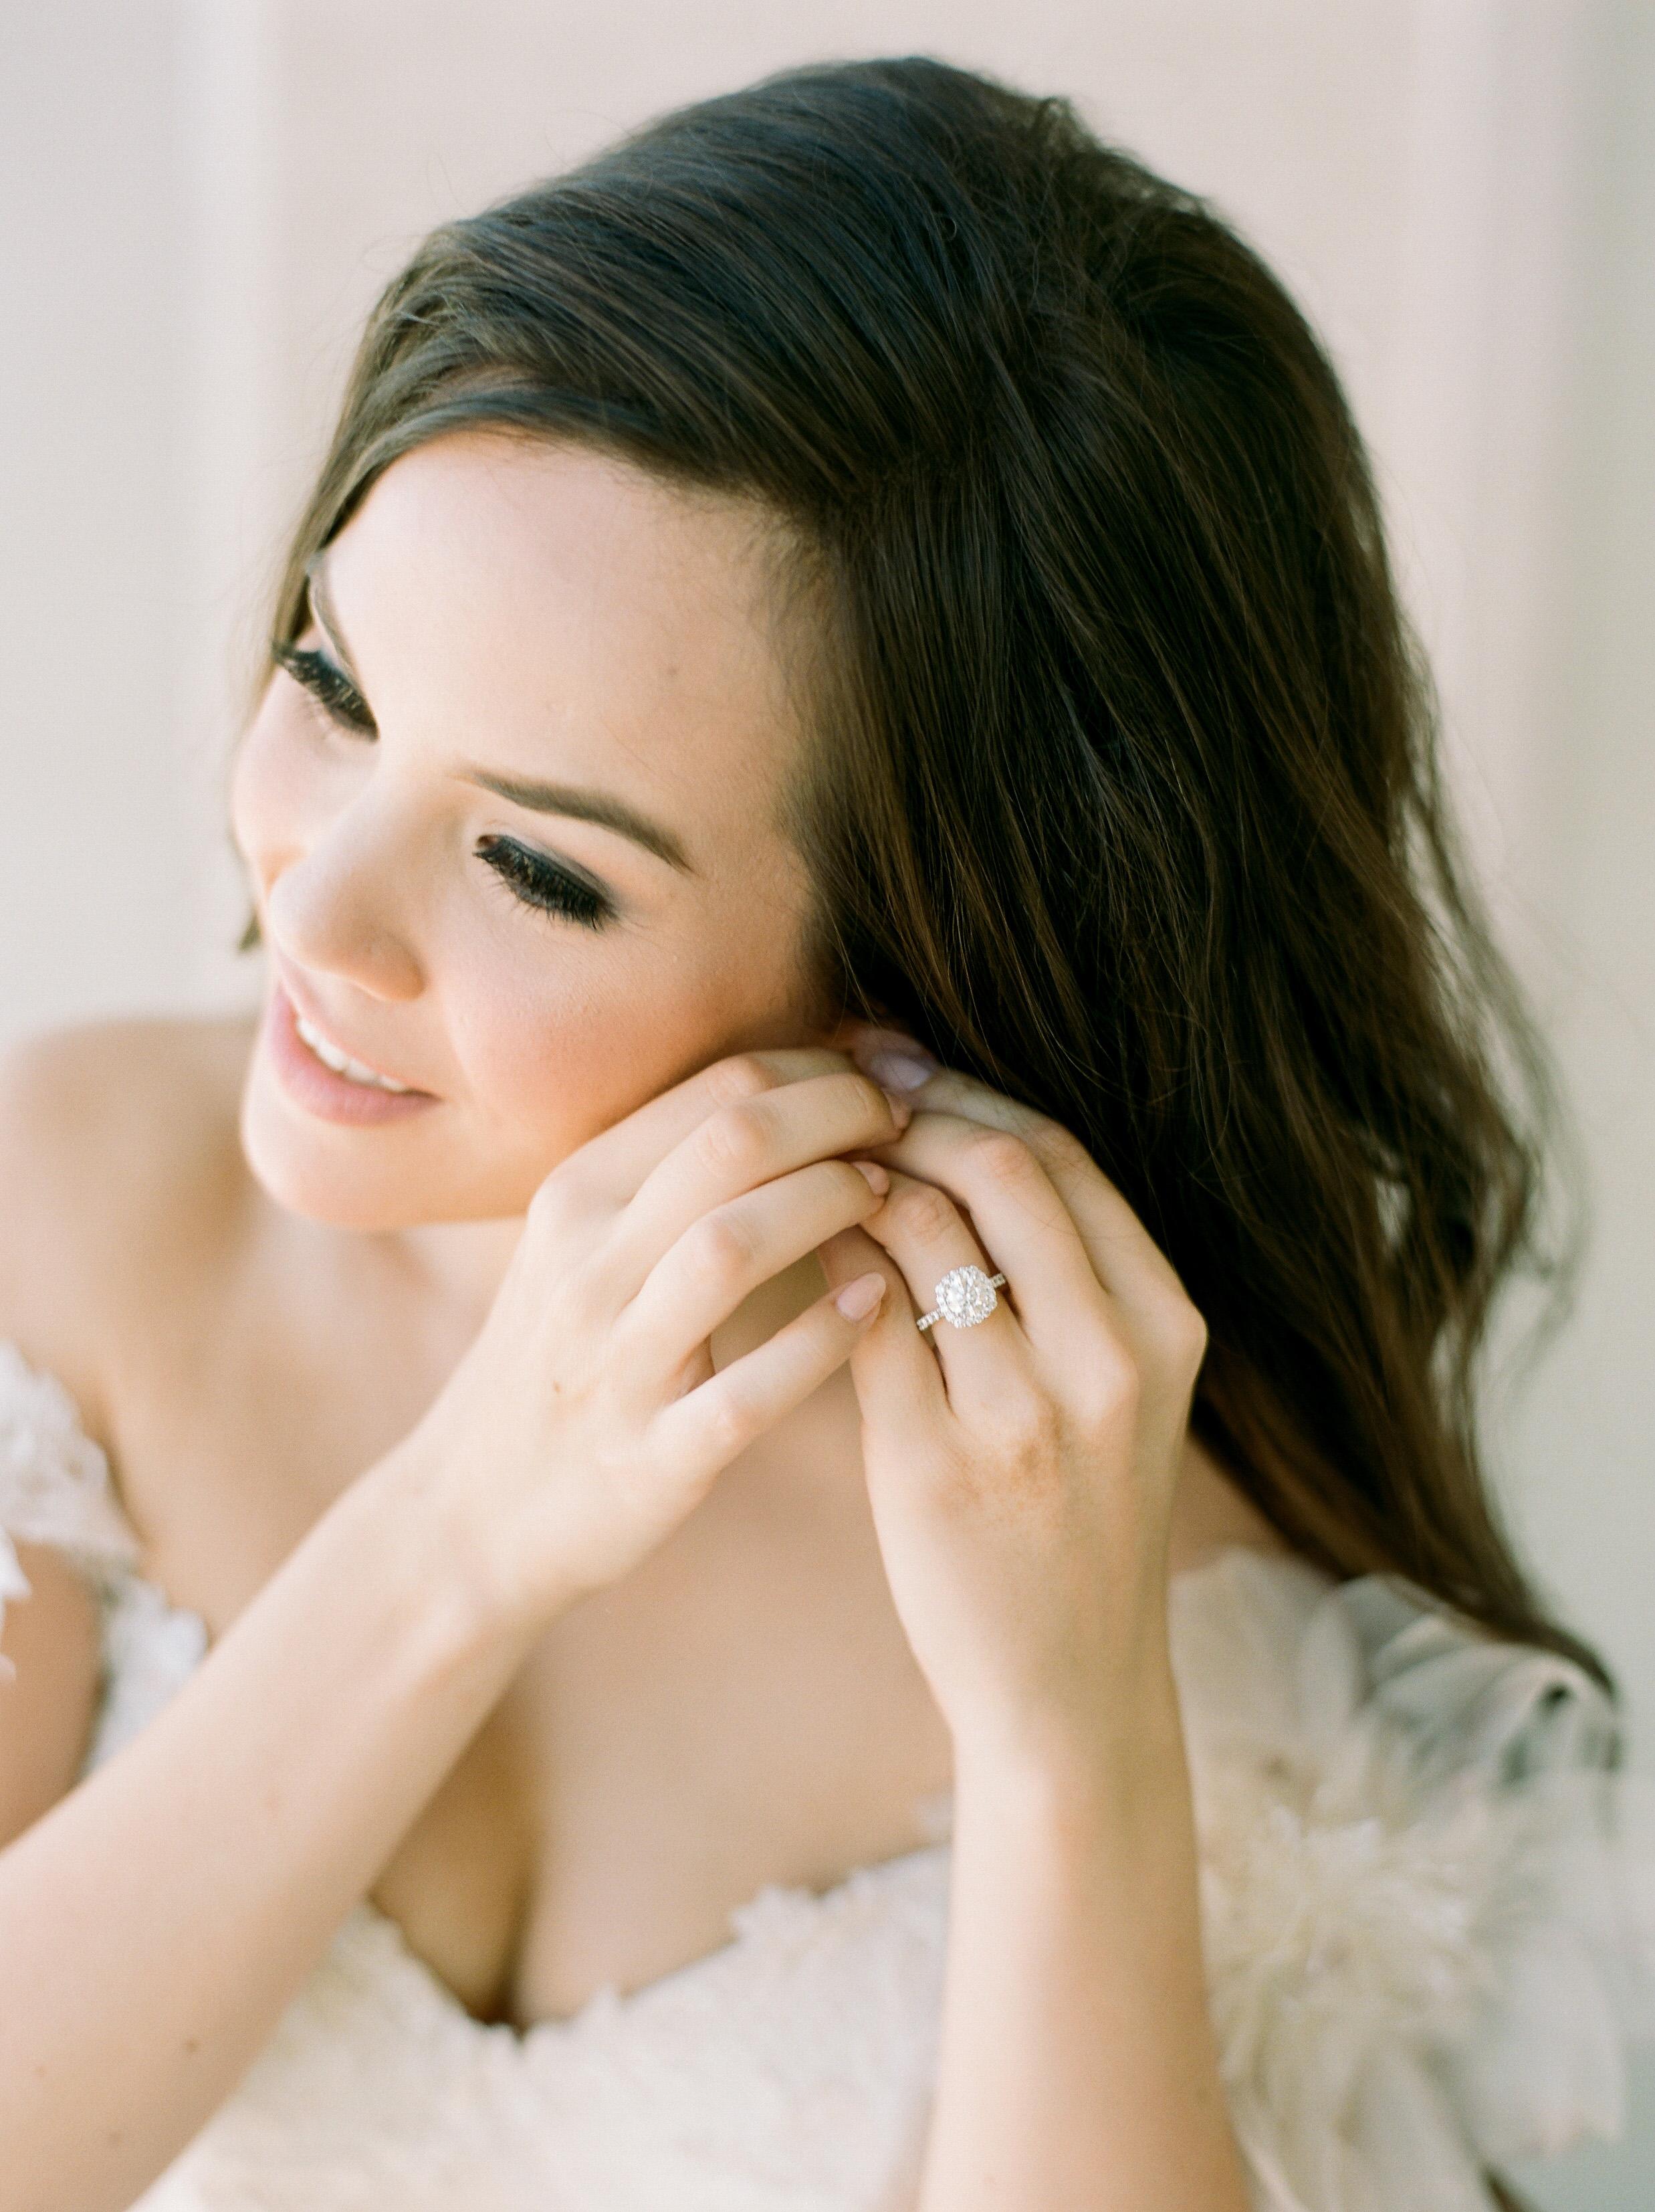 Martha-Stewart-Wedding-Dana-Fernandez-Photography-Josh-Texas-Film-Houston-Wedding-Fine-Art-Photographer-McGovern-Centennial-Gardens-Top-Best-7.jpg